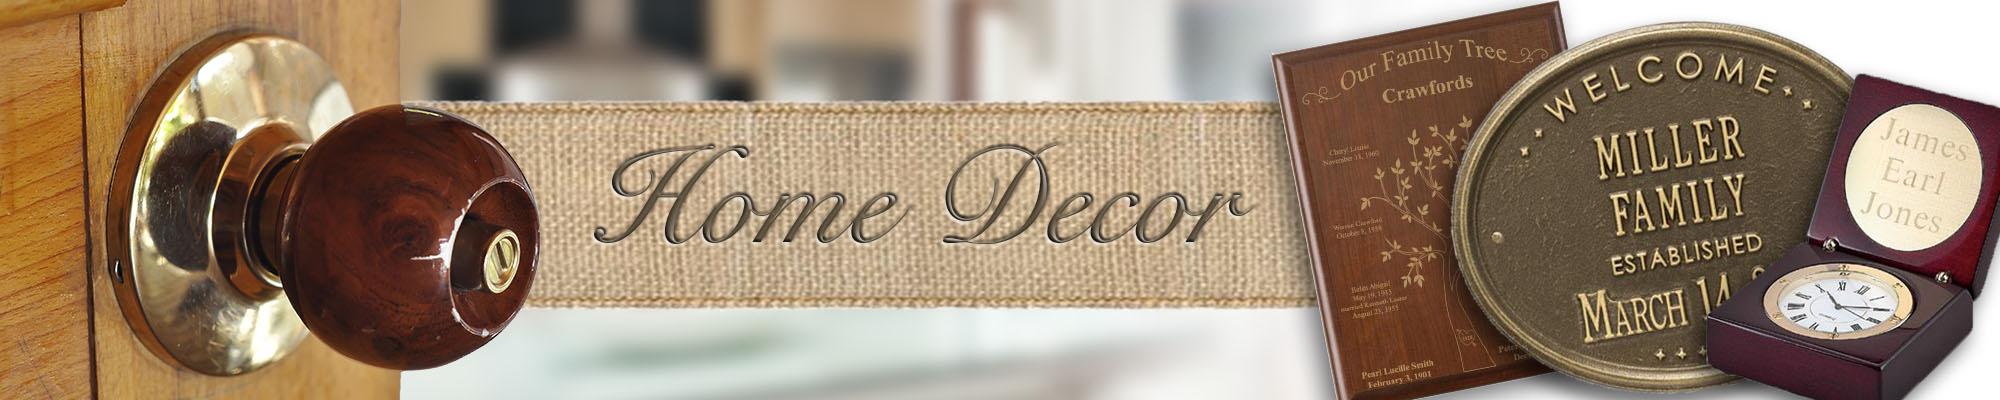 Personalized Home Decor